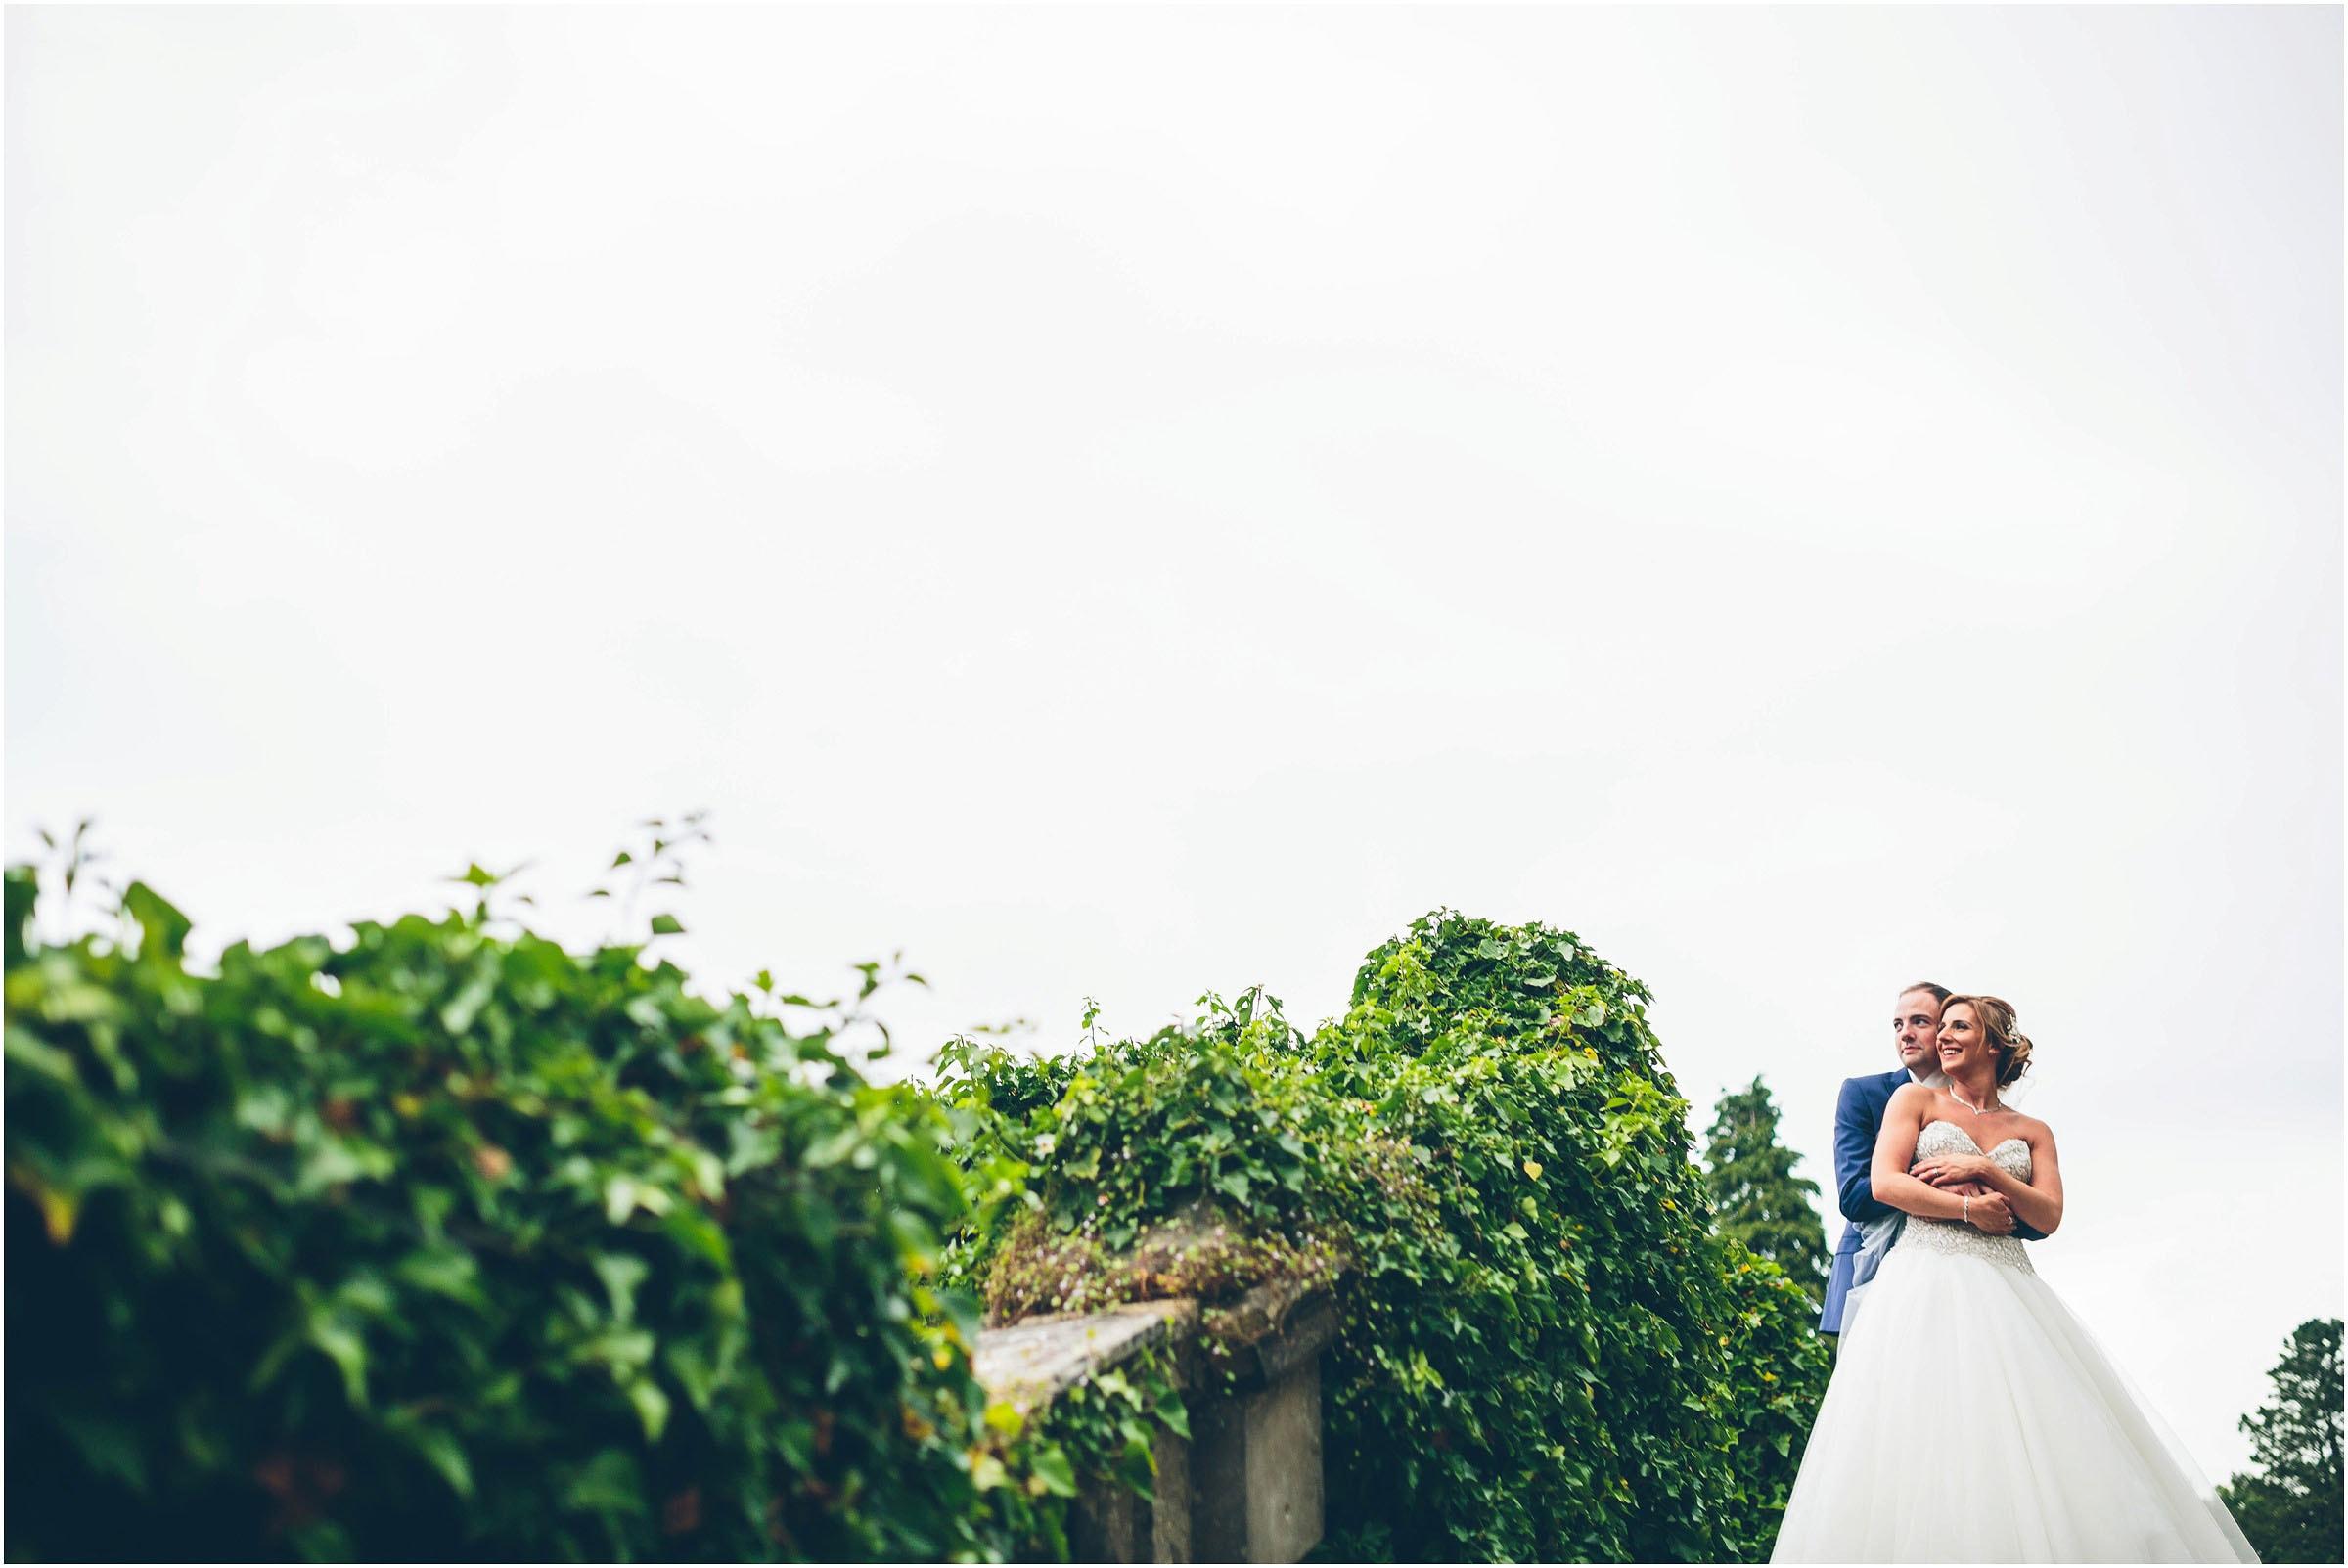 Mitton_Hall_Wedding_Photography_0098